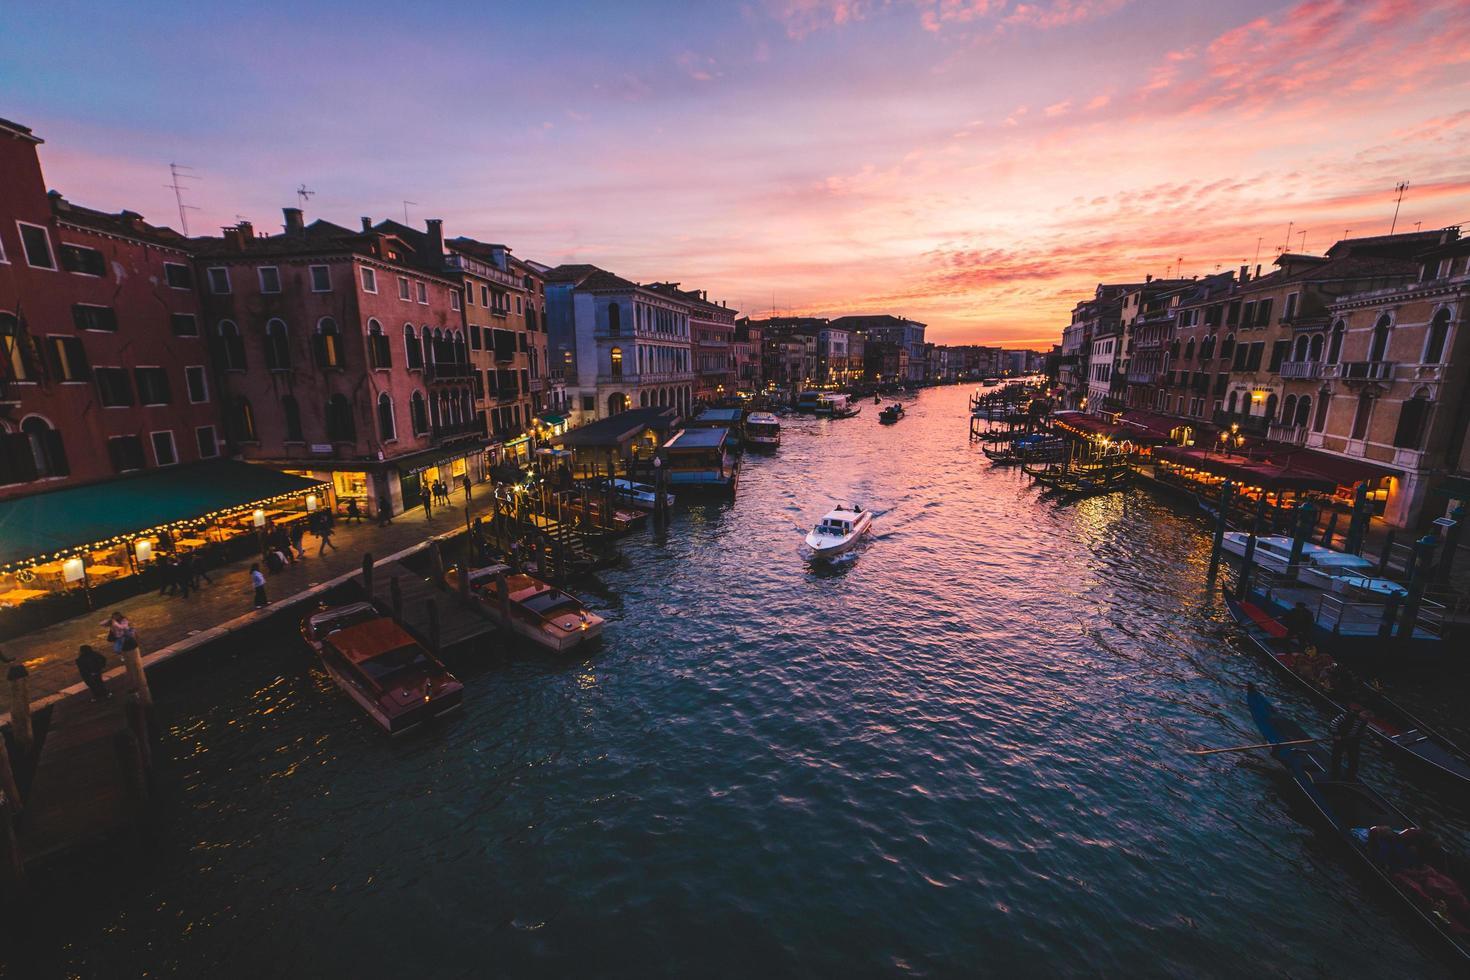 Grand Canal in Venedig bei Sonnenuntergang foto